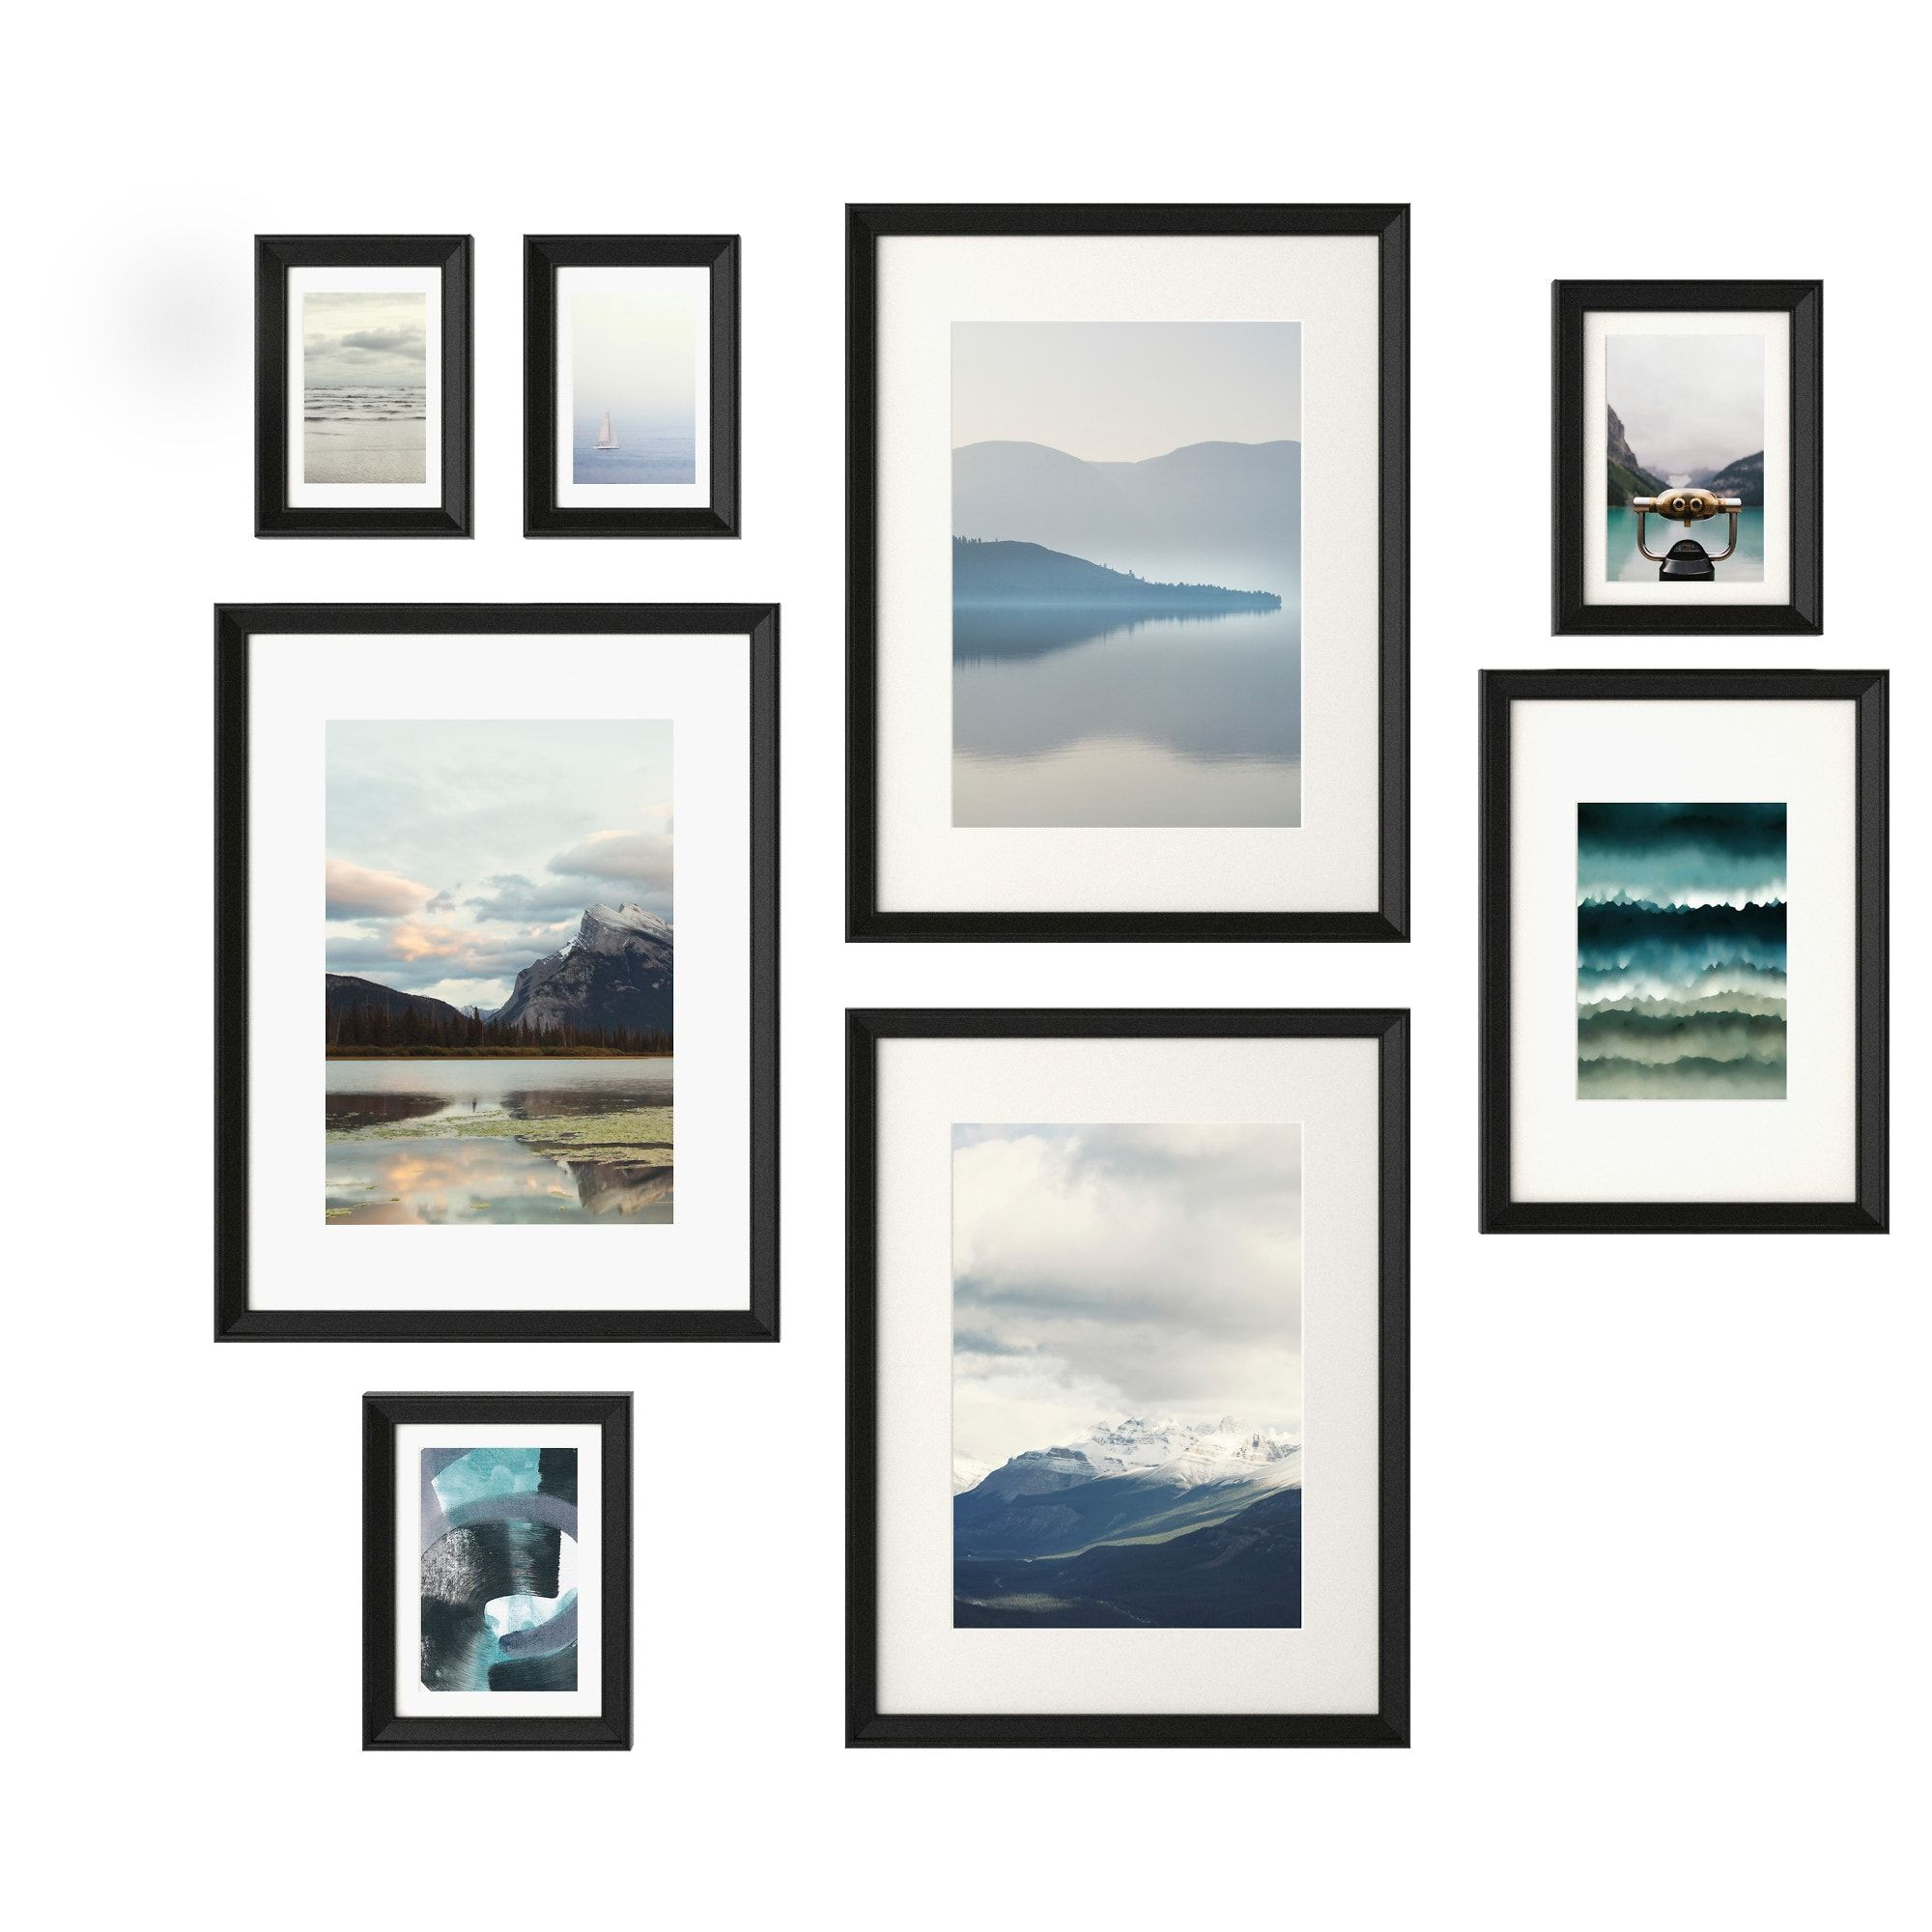 knopp ng cadre avec image 8 pi ces noir 31st bday pinterest cadres ikea et pi ce. Black Bedroom Furniture Sets. Home Design Ideas